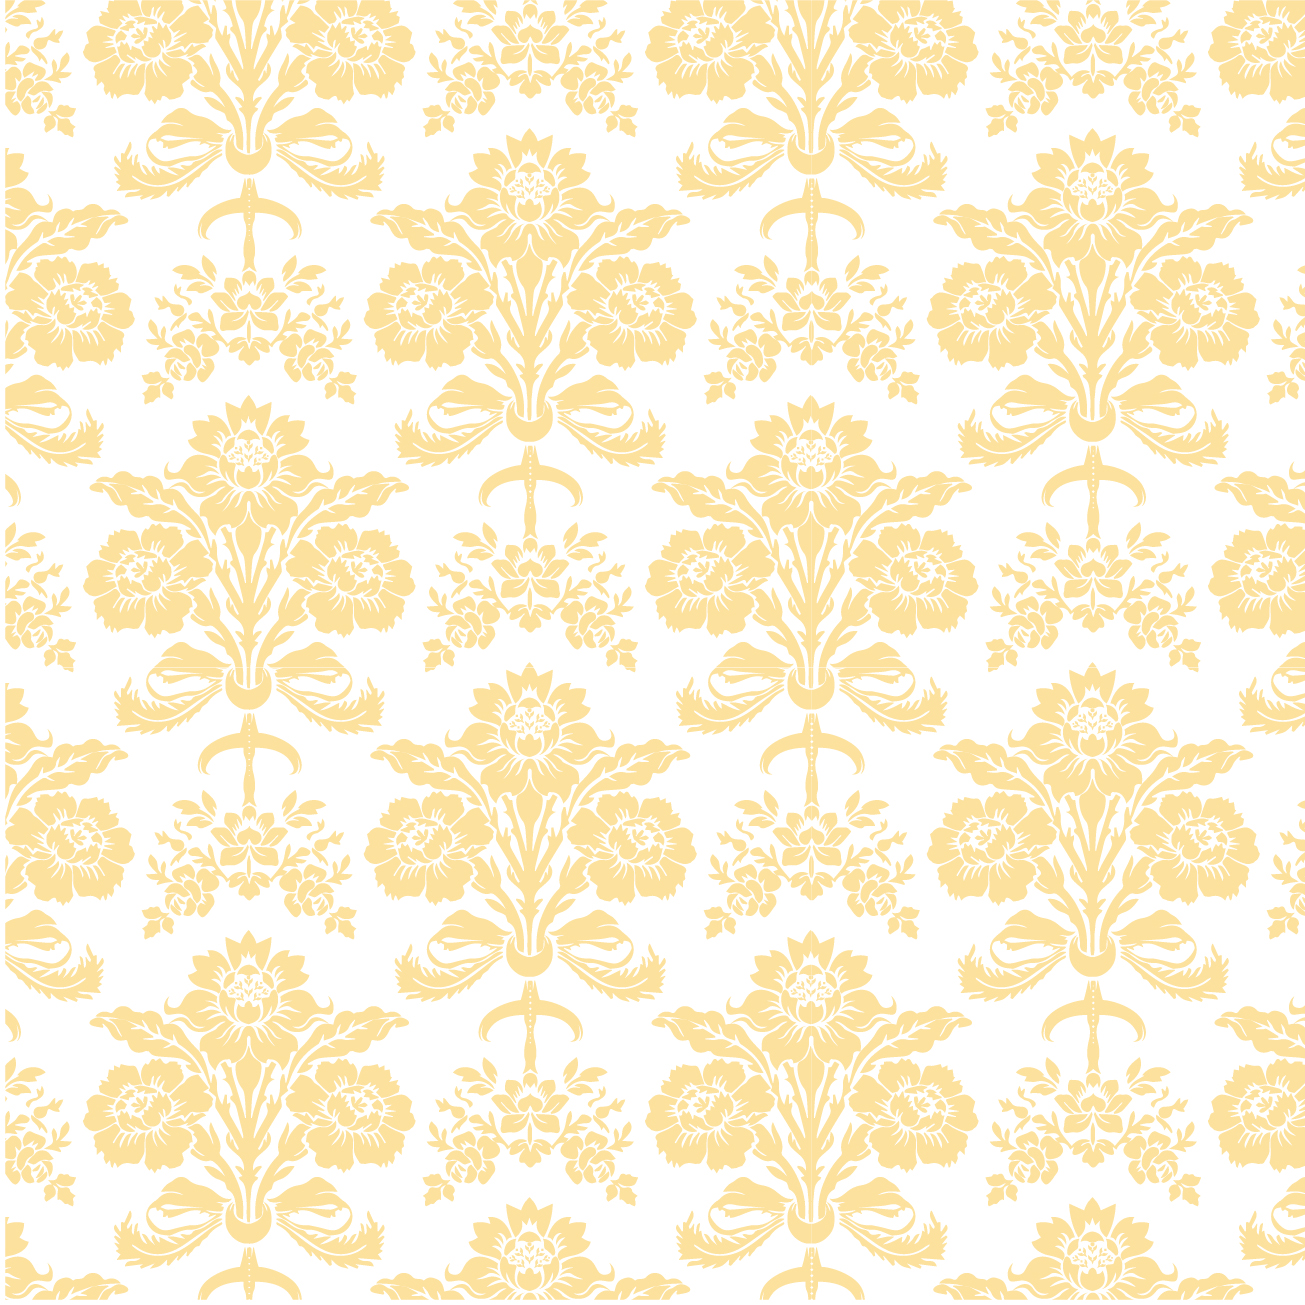 melos_logo_pattern-17.jpg